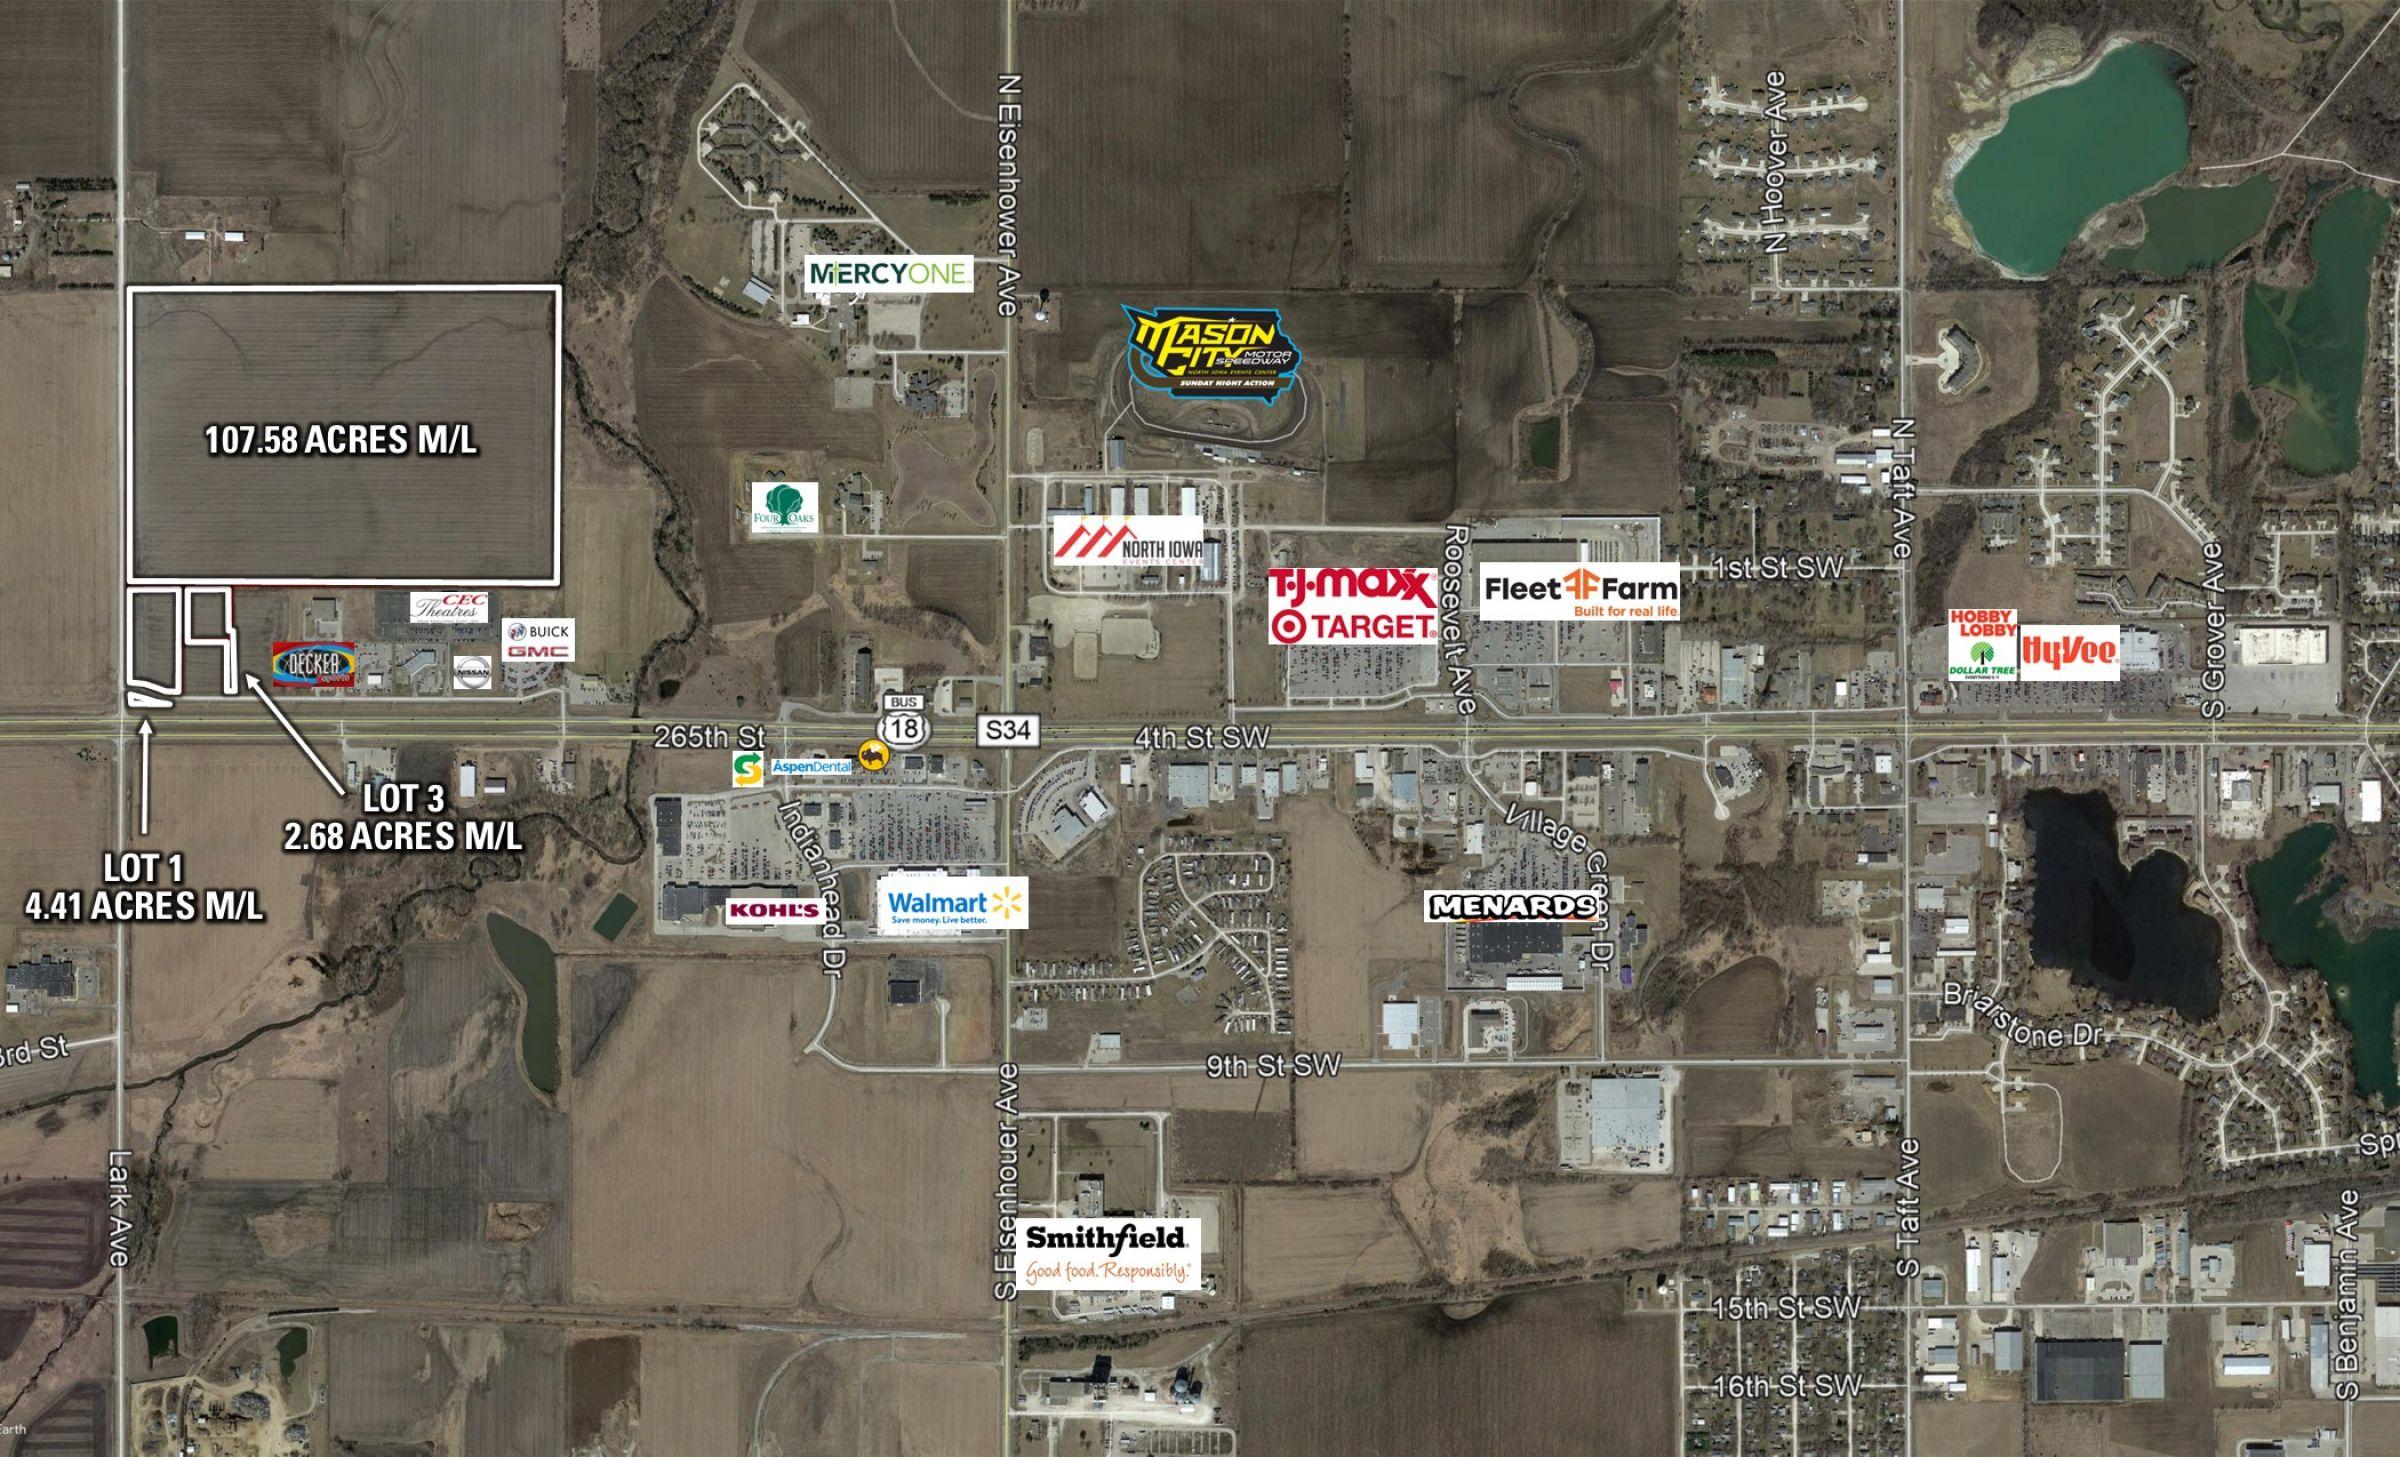 development-land-commercial-cerro-gordo-county-iowa-3-acres-listing-number-15643-0-2021-07-20-164859.jpg